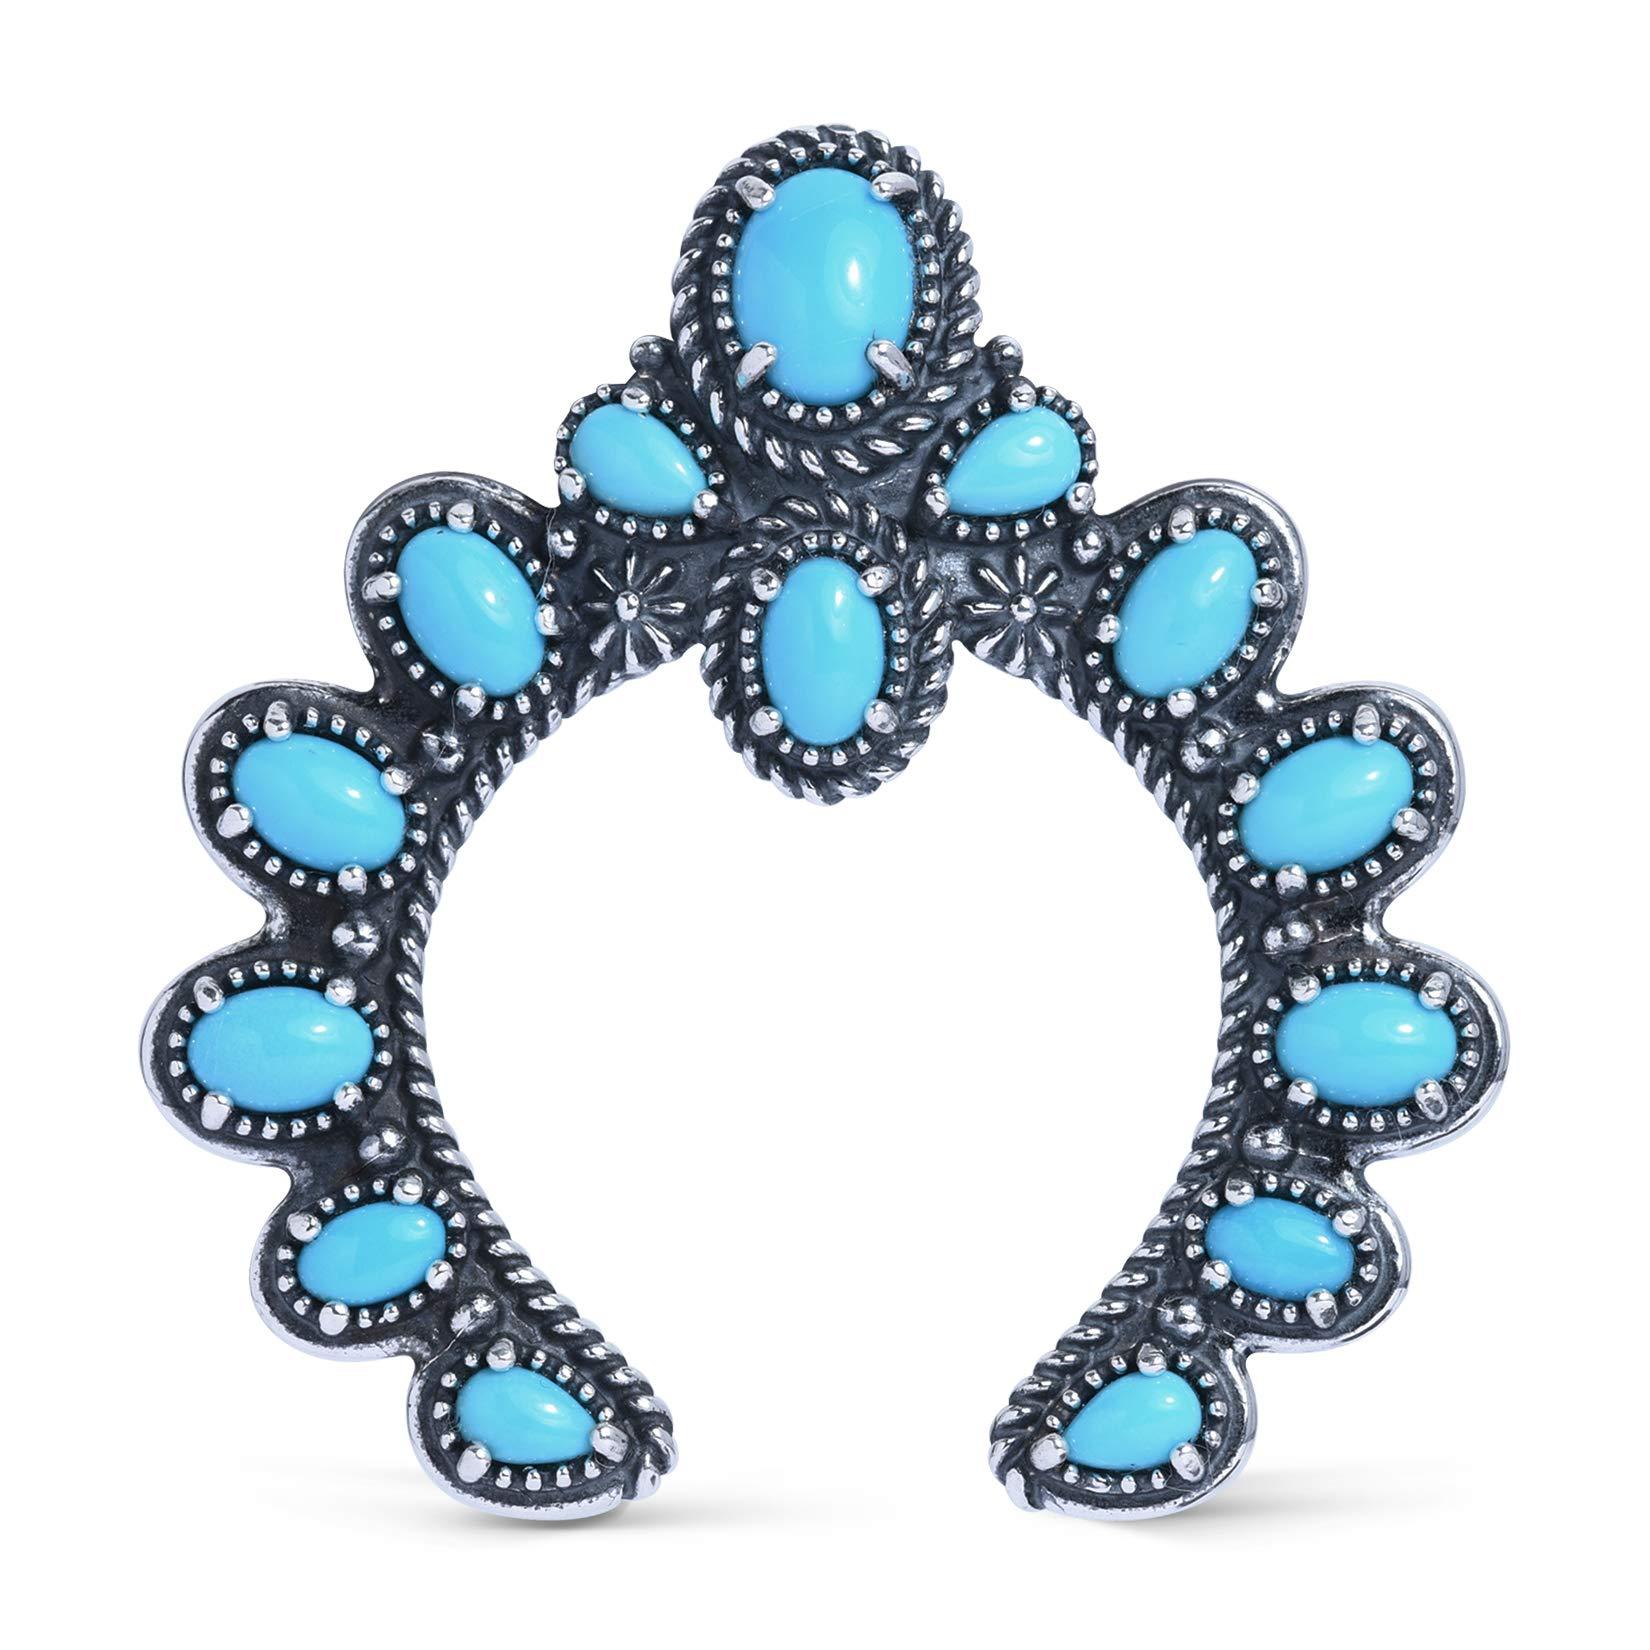 American West Sterling Silver Sleeping Beauty Turquoise Naja Pendant Enhancer